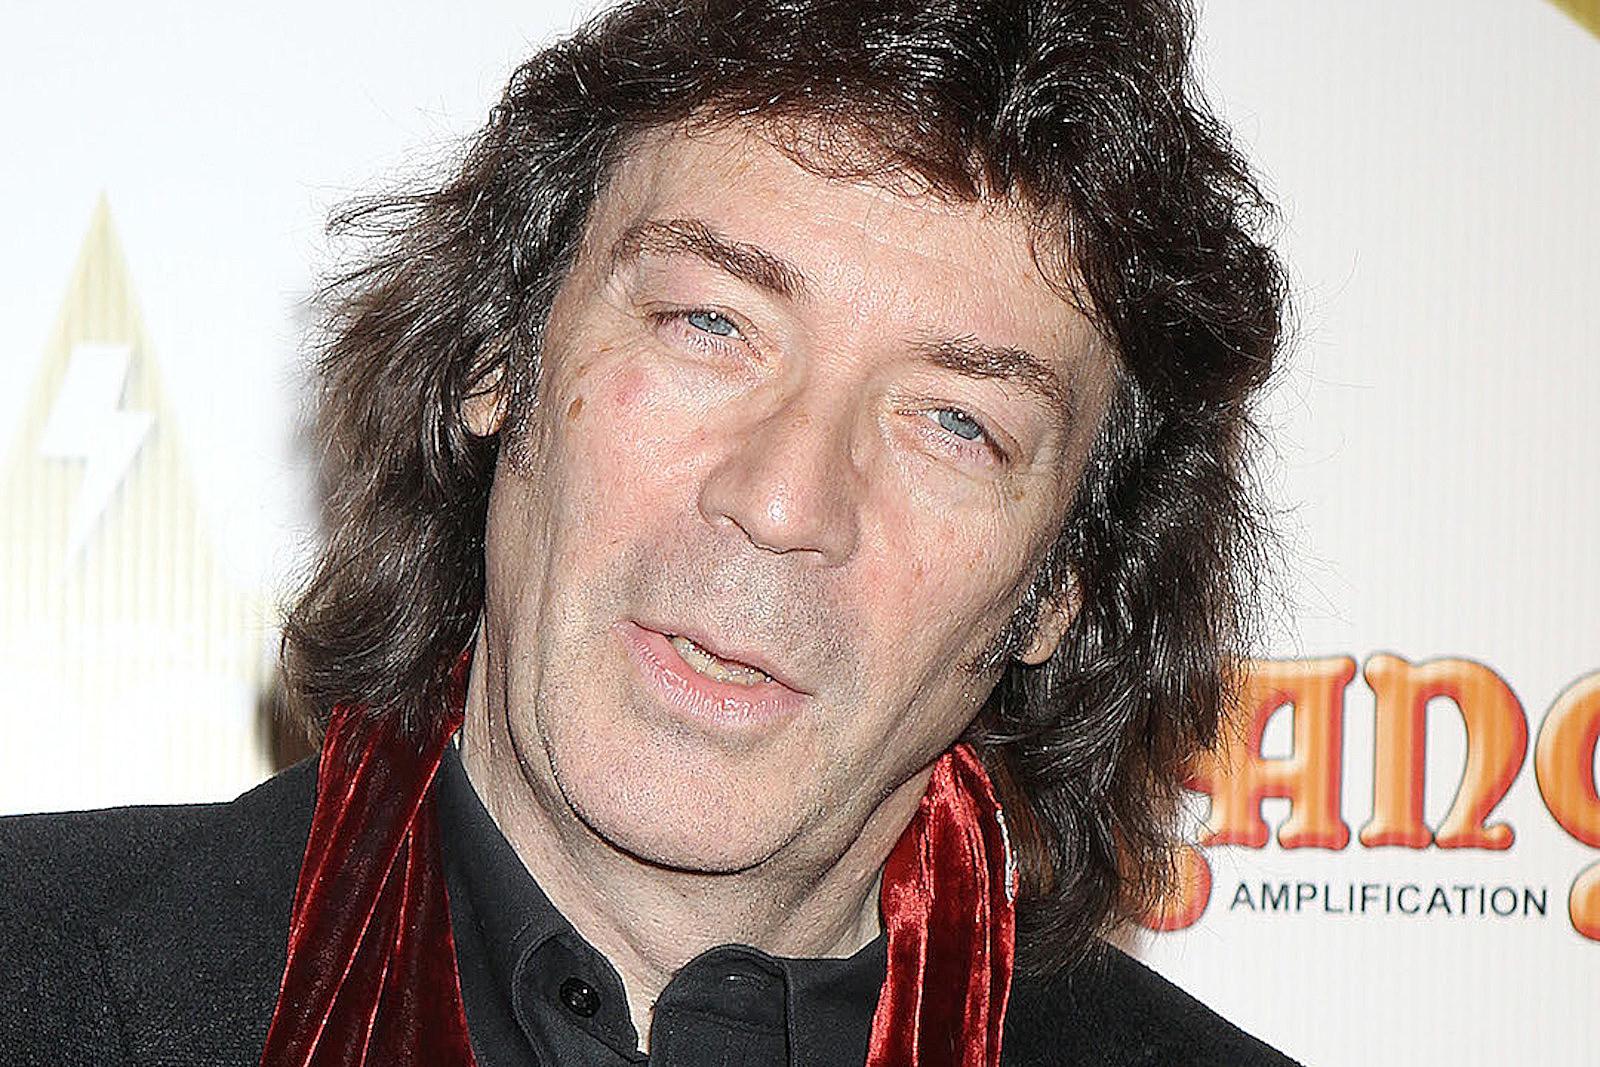 Steve Hackett on Quitting Genesis: Band Democracy 'Rarely Works'